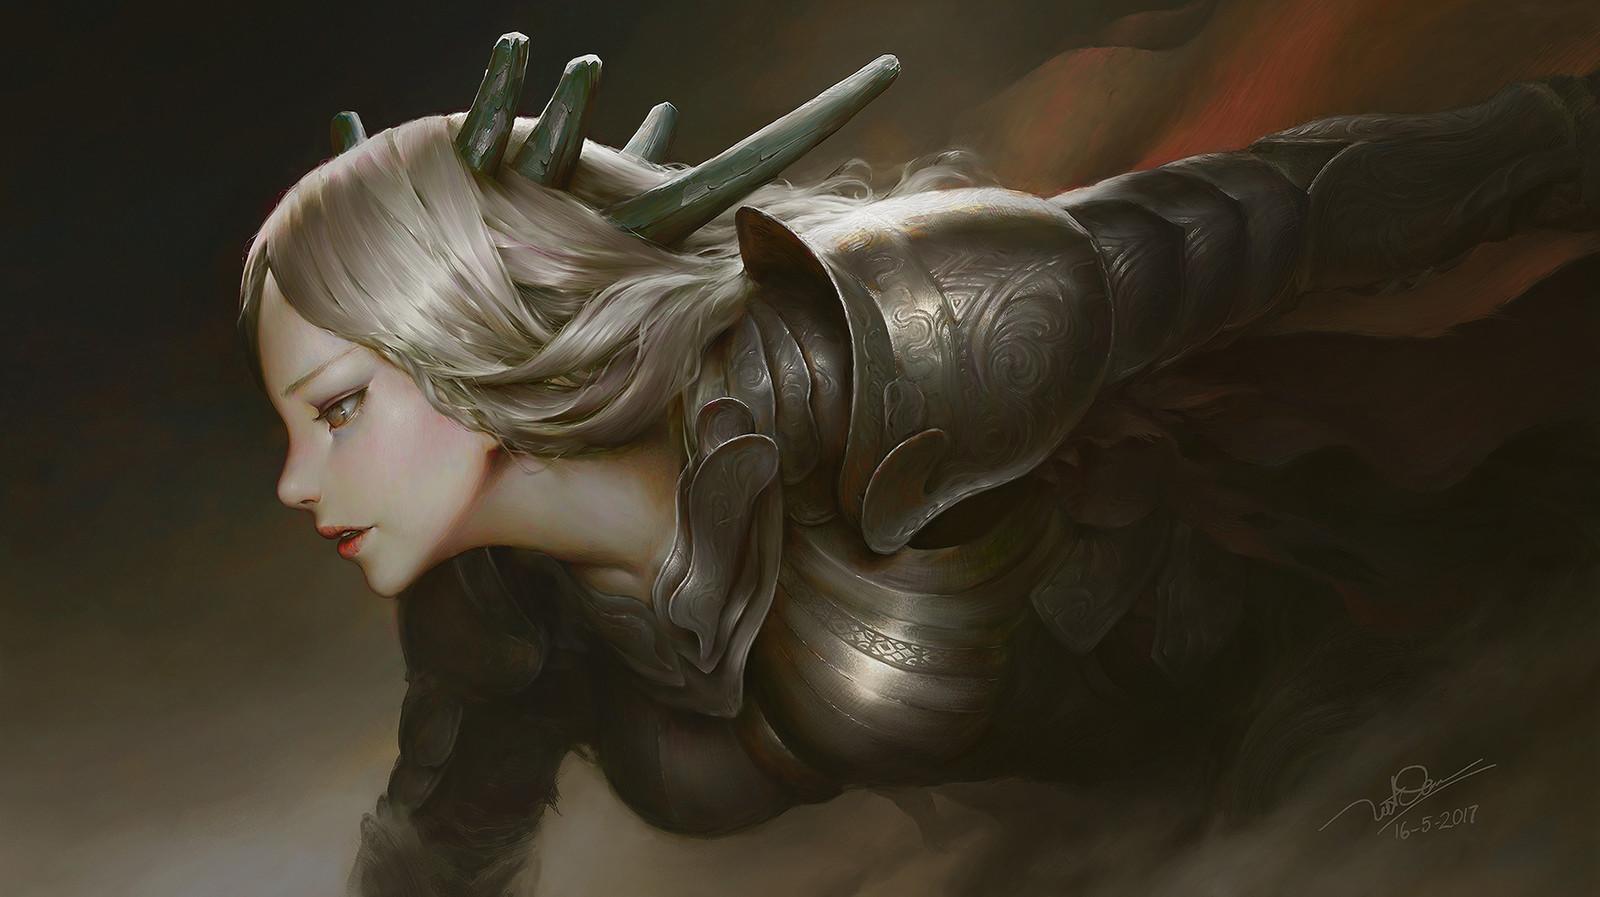 Dephanie – the Light warrior